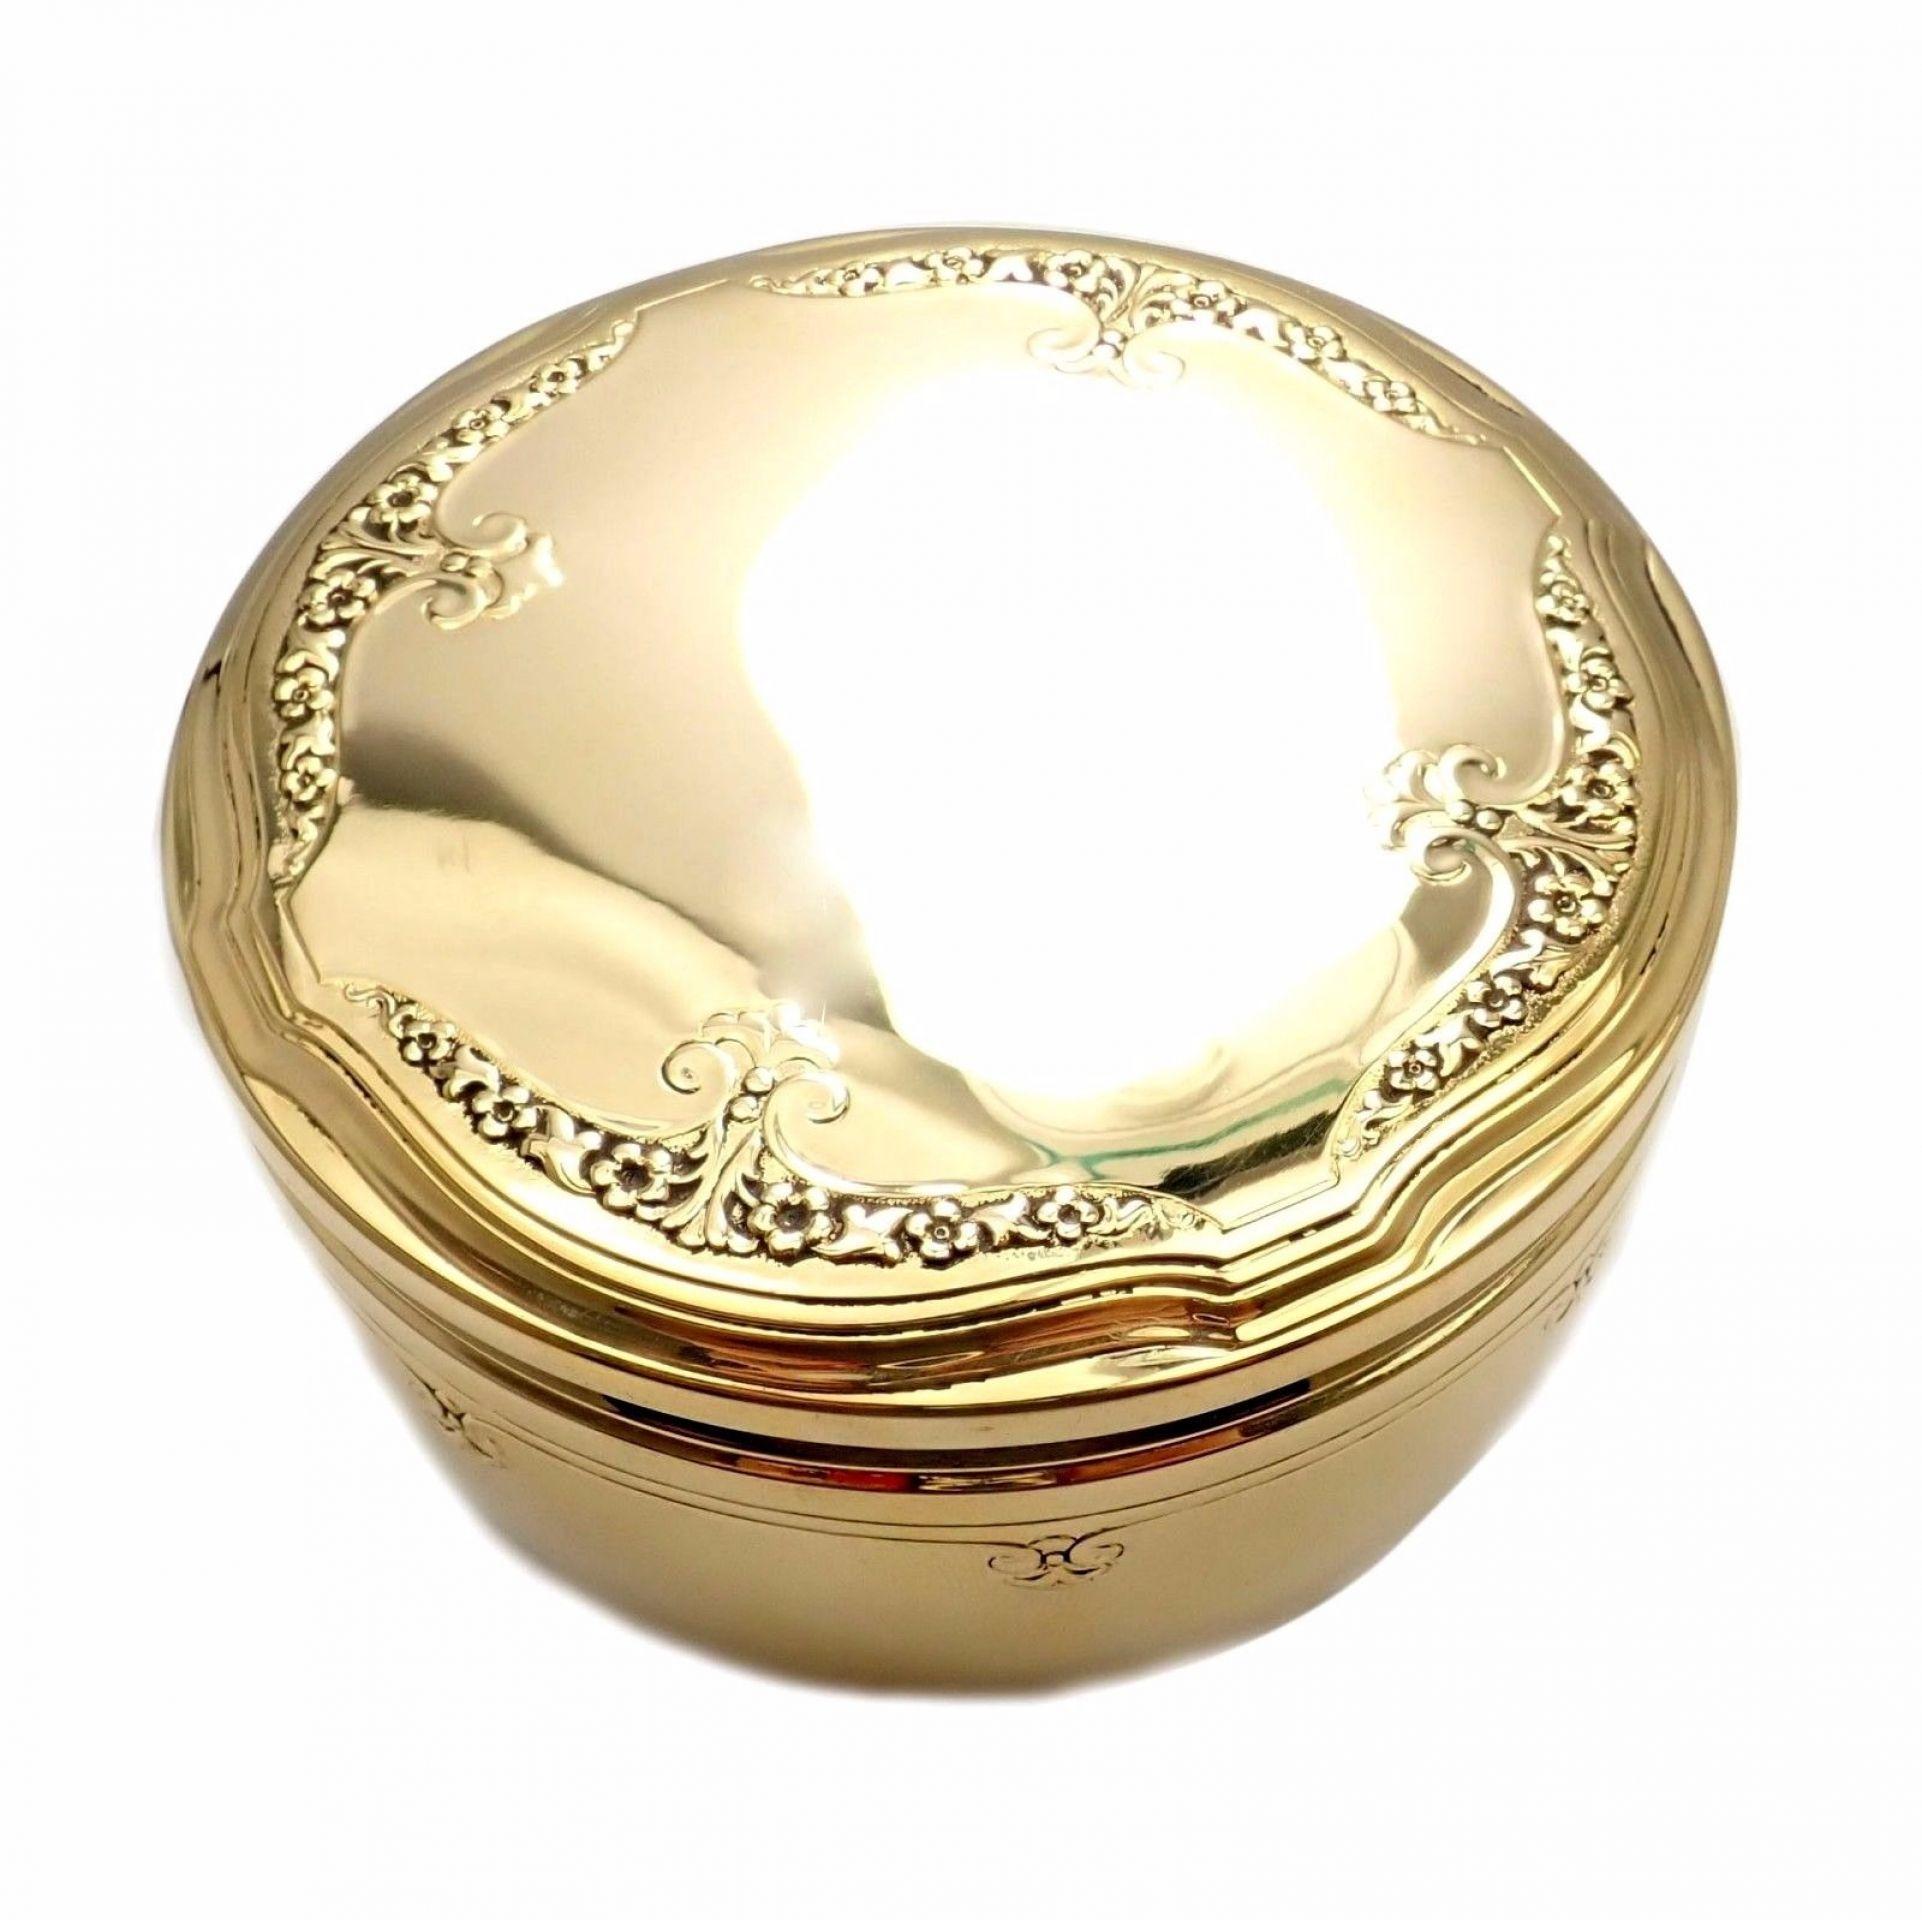 Rare! Antique Vintage Tiffany & Co 18k Solid 269.1 Grams Yellow Gold Jar c.1910